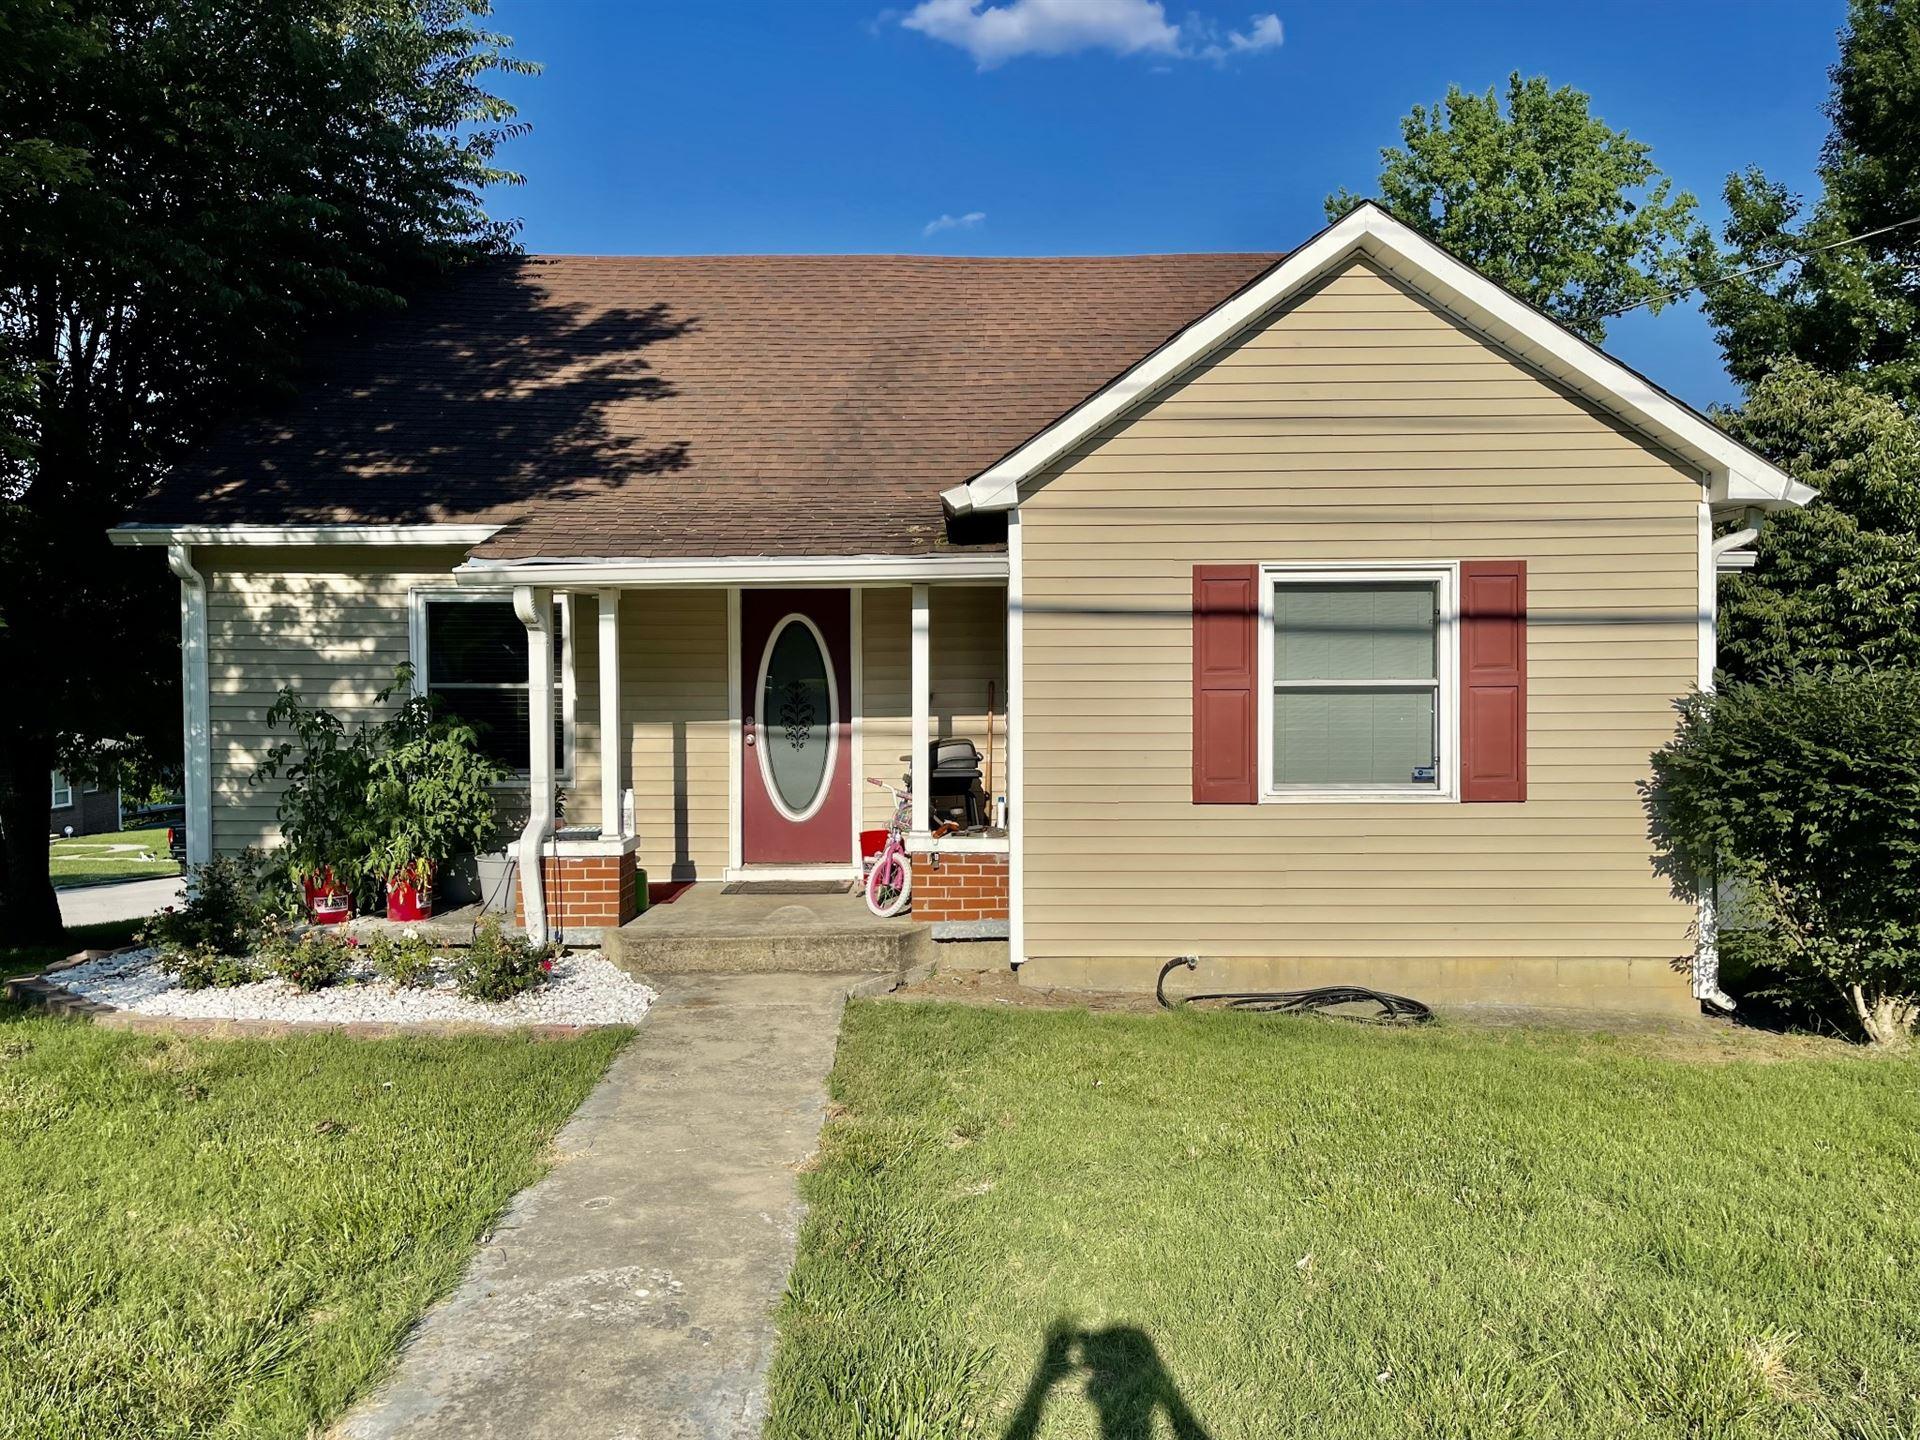 118 Dogwood St, Carthage, TN 37030 - MLS#: 2264144